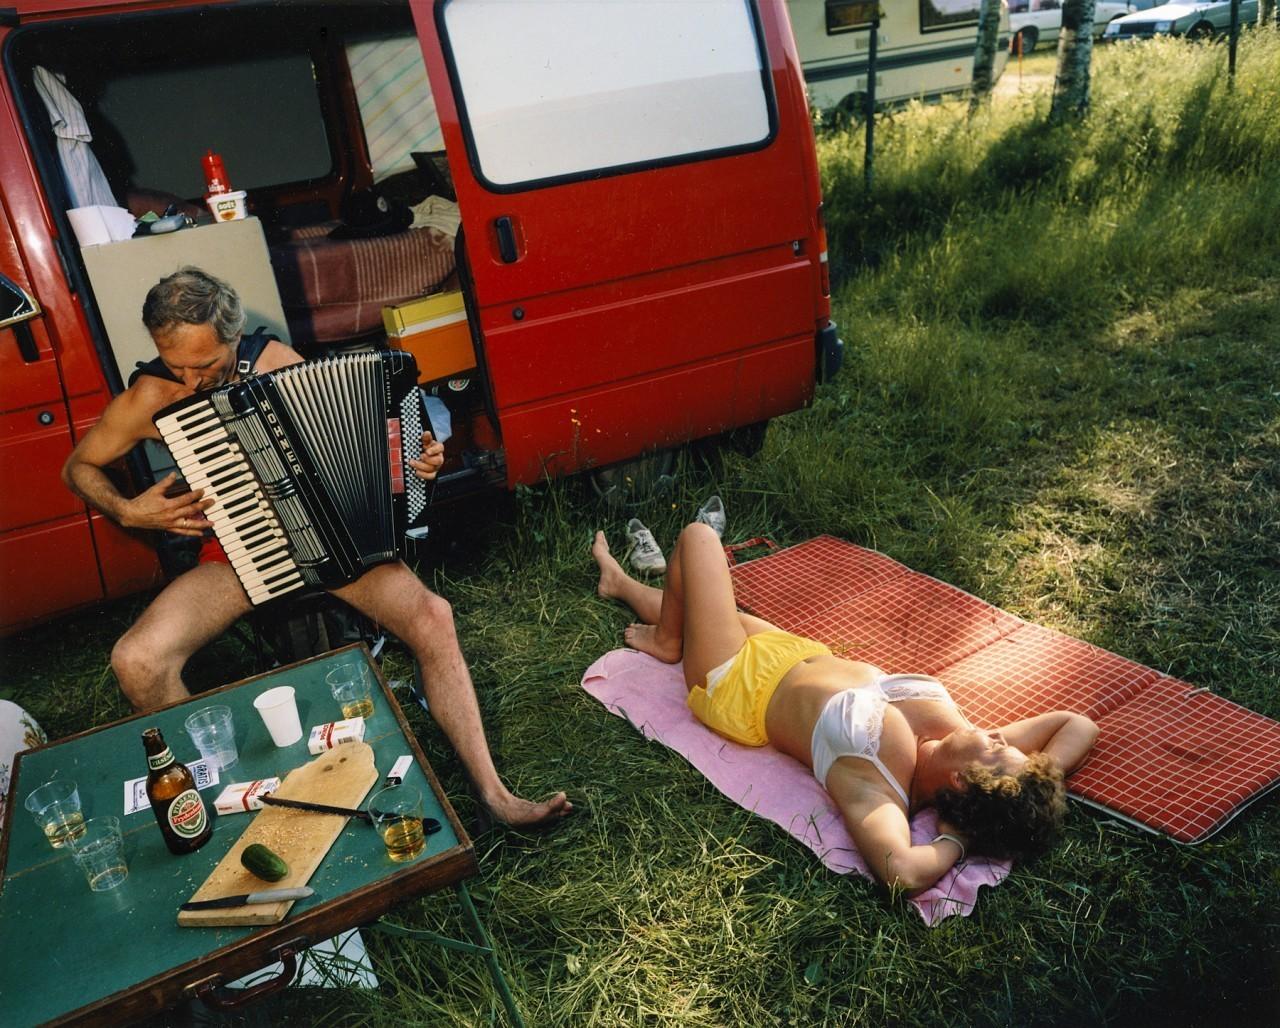 Швеция. Фотограф Ларс Тунбьёрк